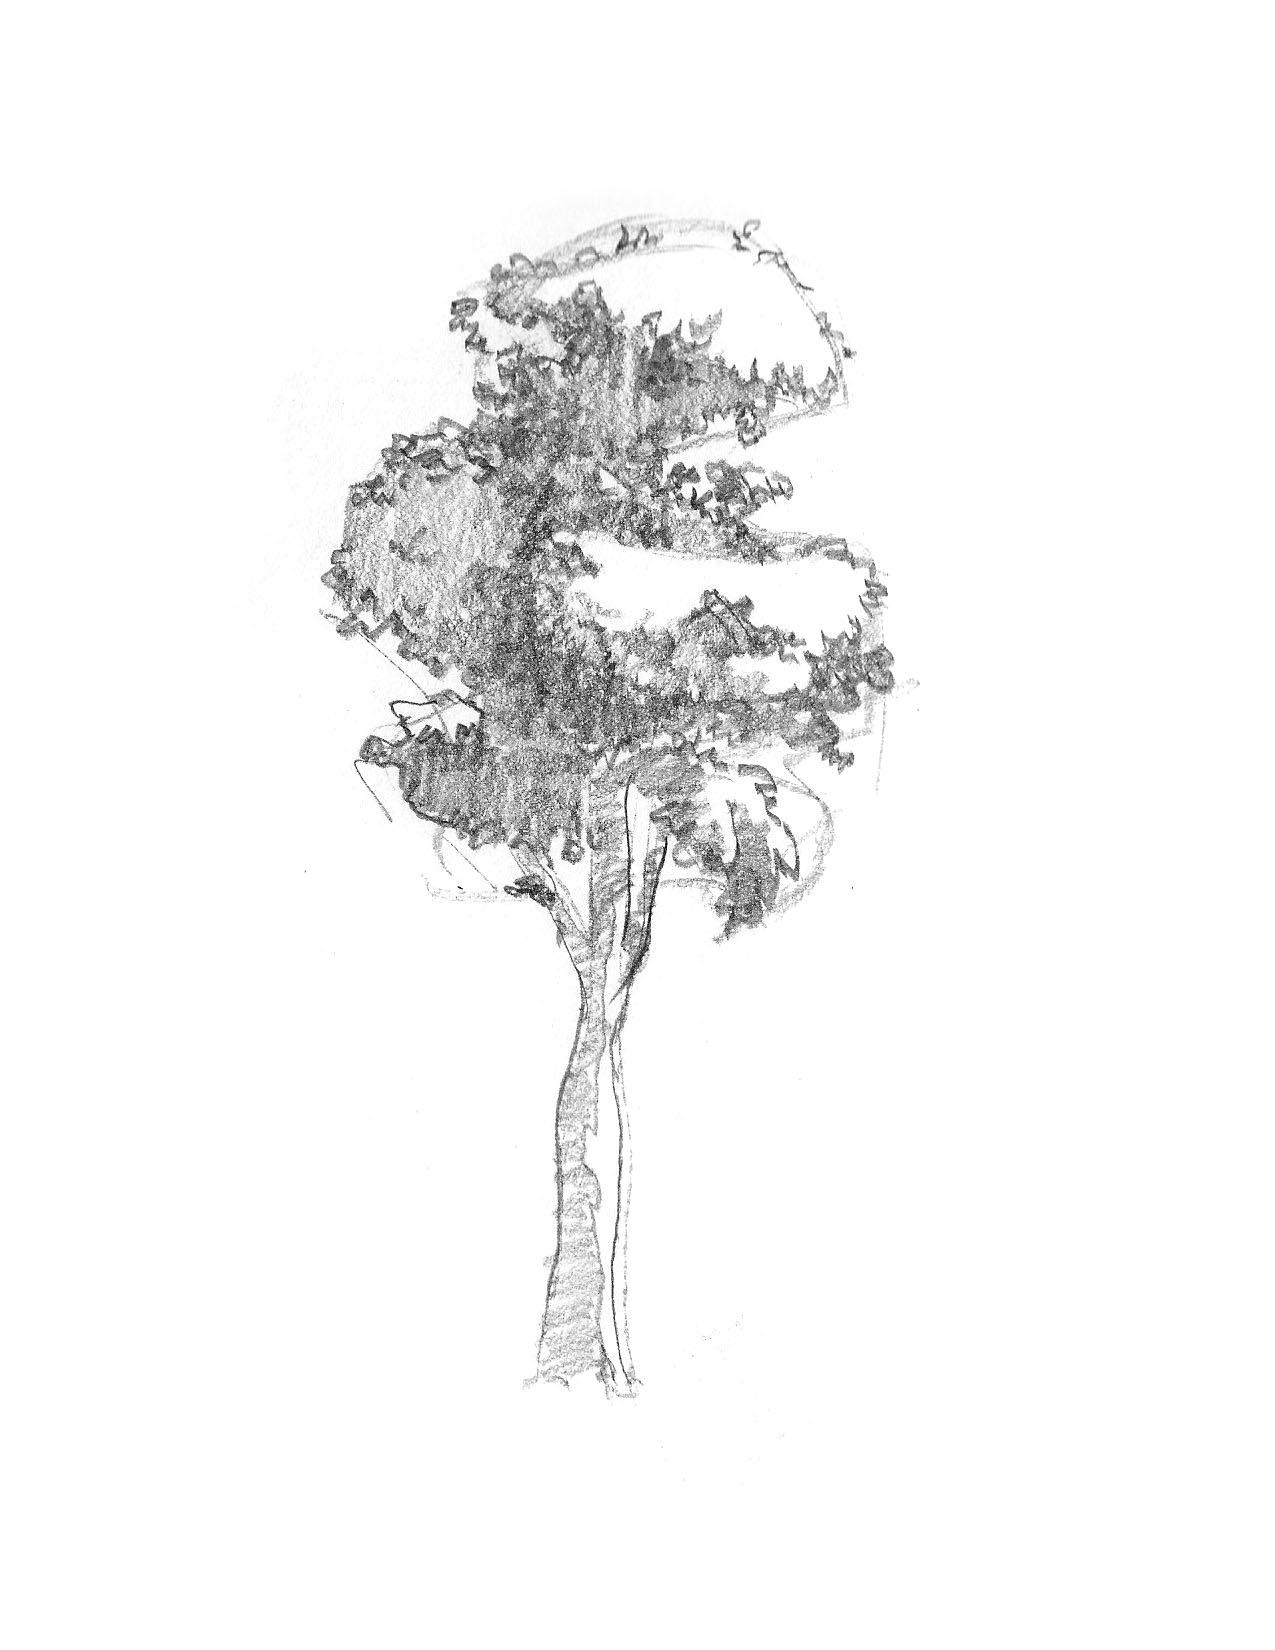 2018-09_Tree 08.jpg